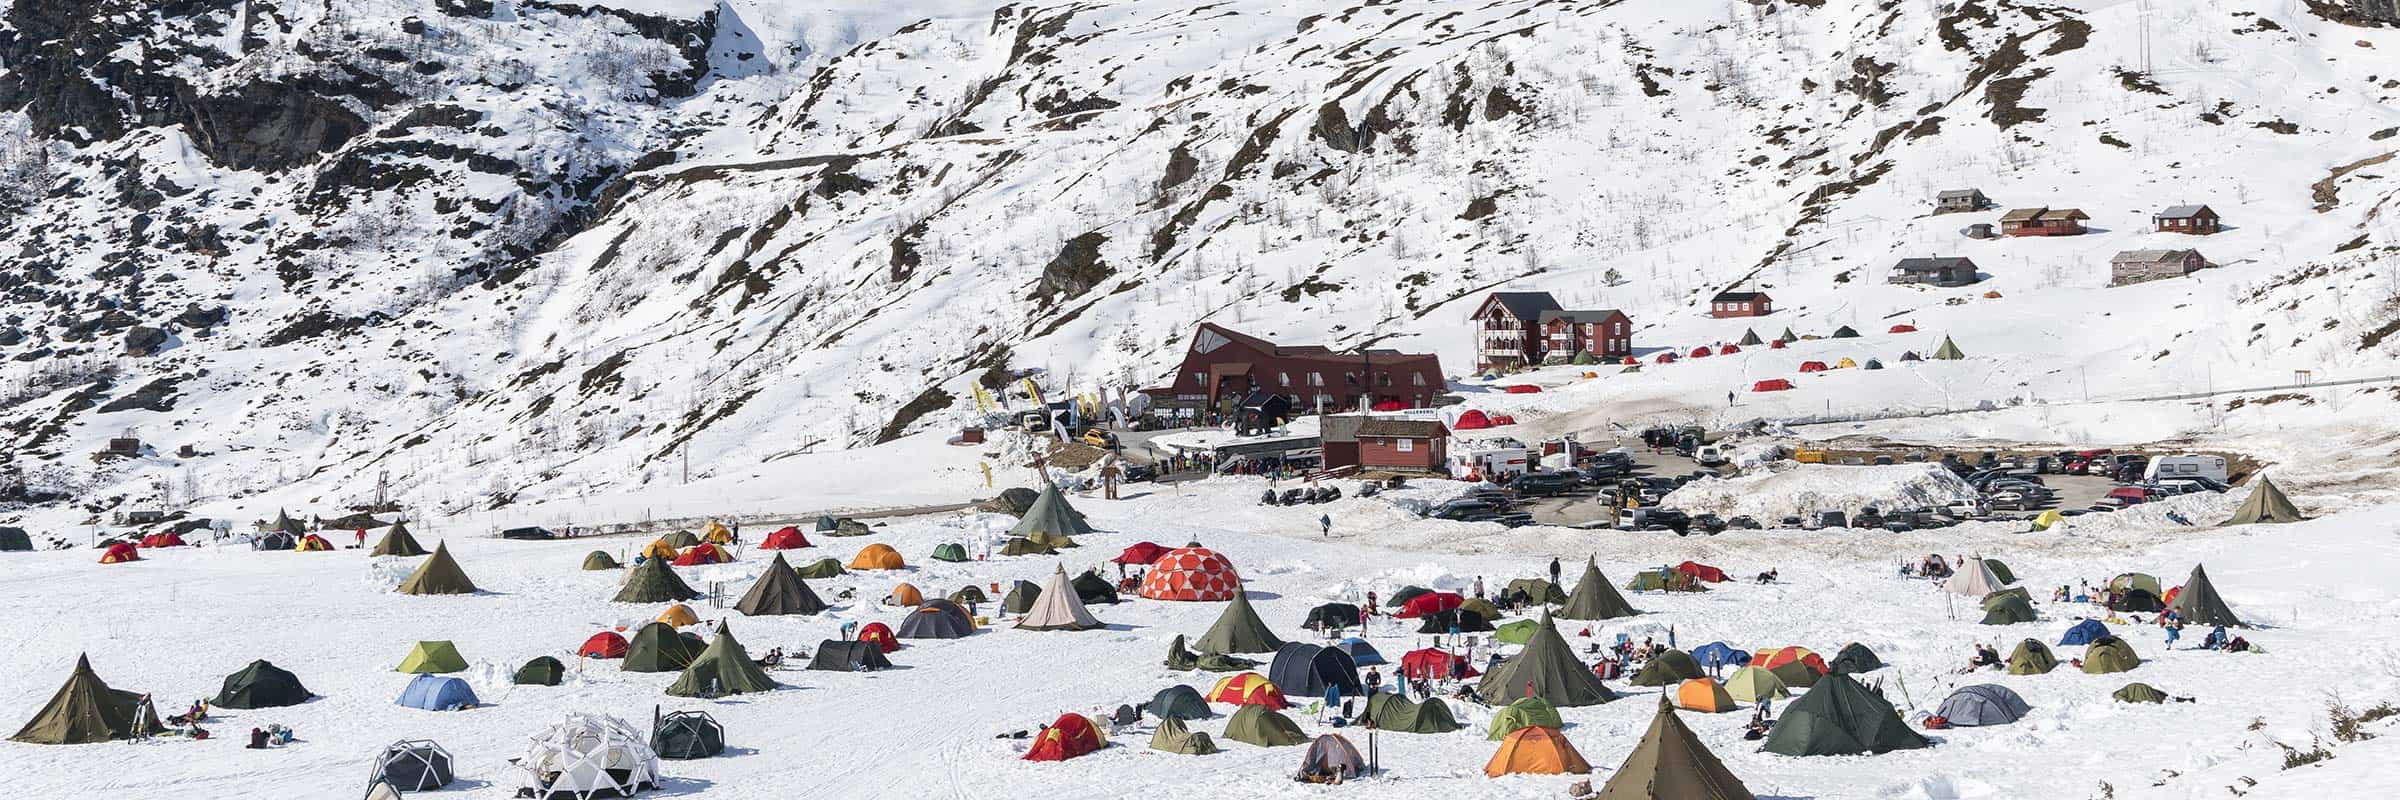 turtagro high camp